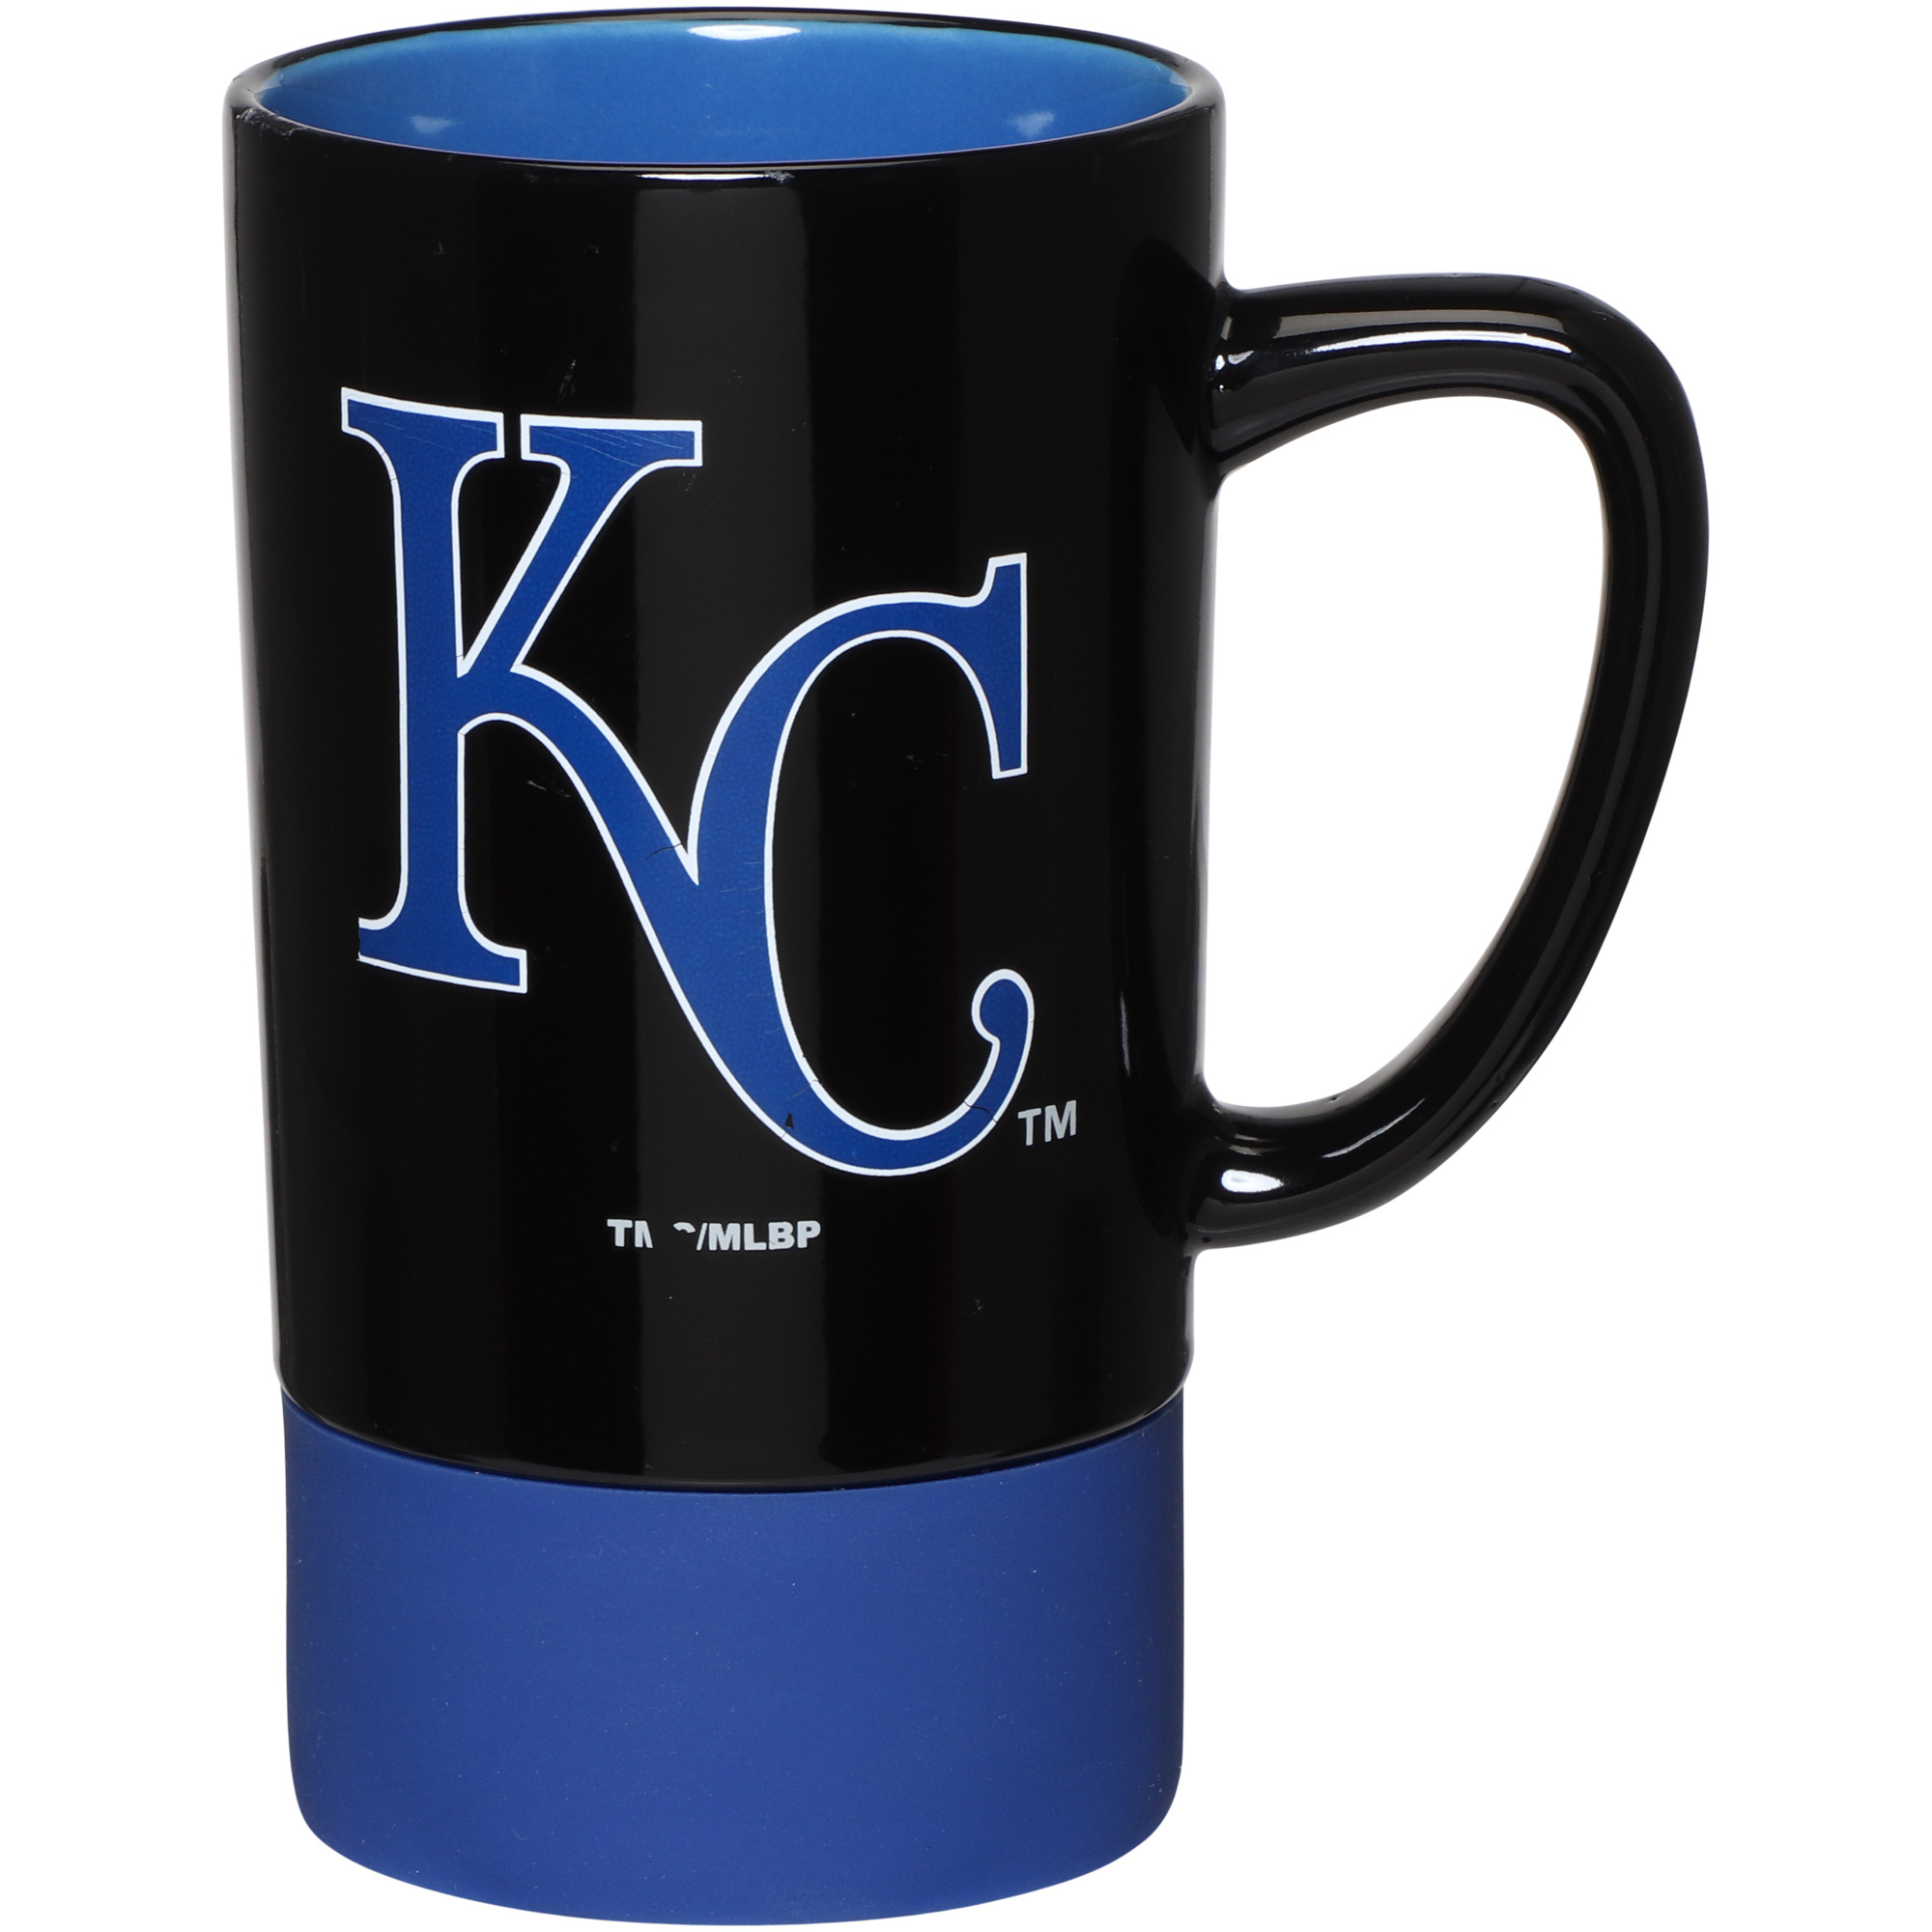 Kansas City Royals 16oz. Coaster Mug - No Size